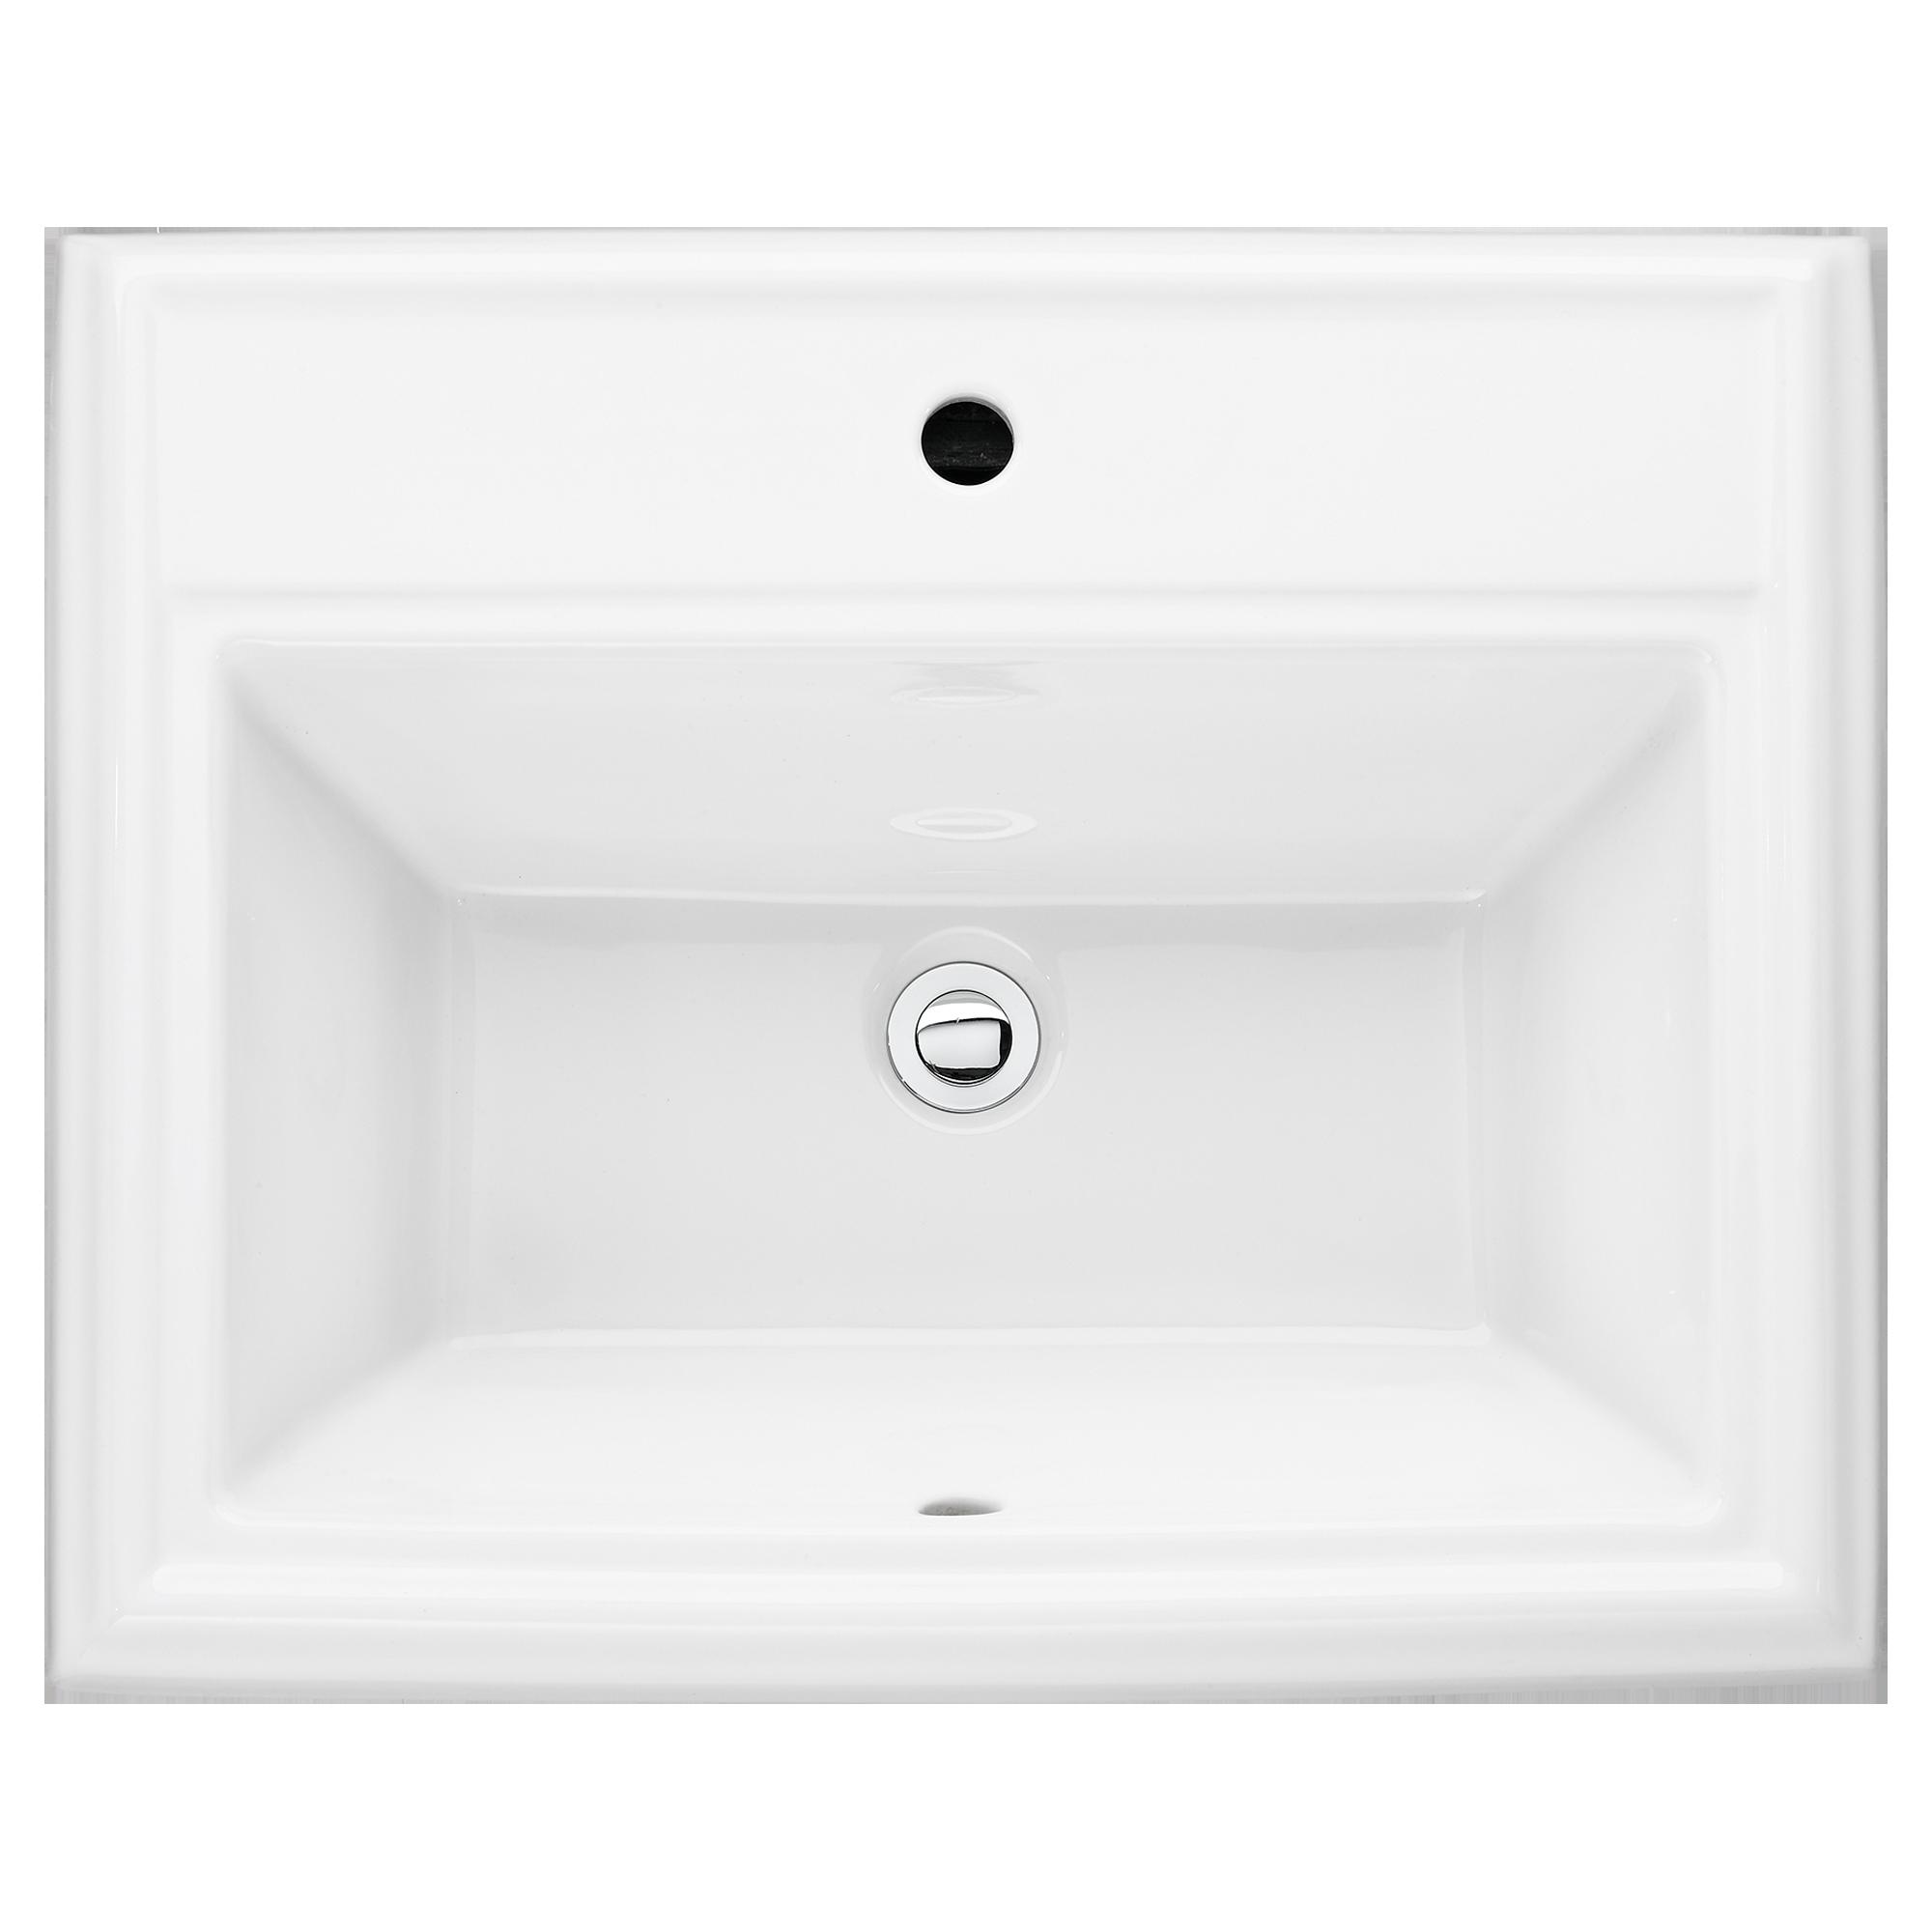 Sink Png Image Purepng Free Transparent Cc0 Png Image